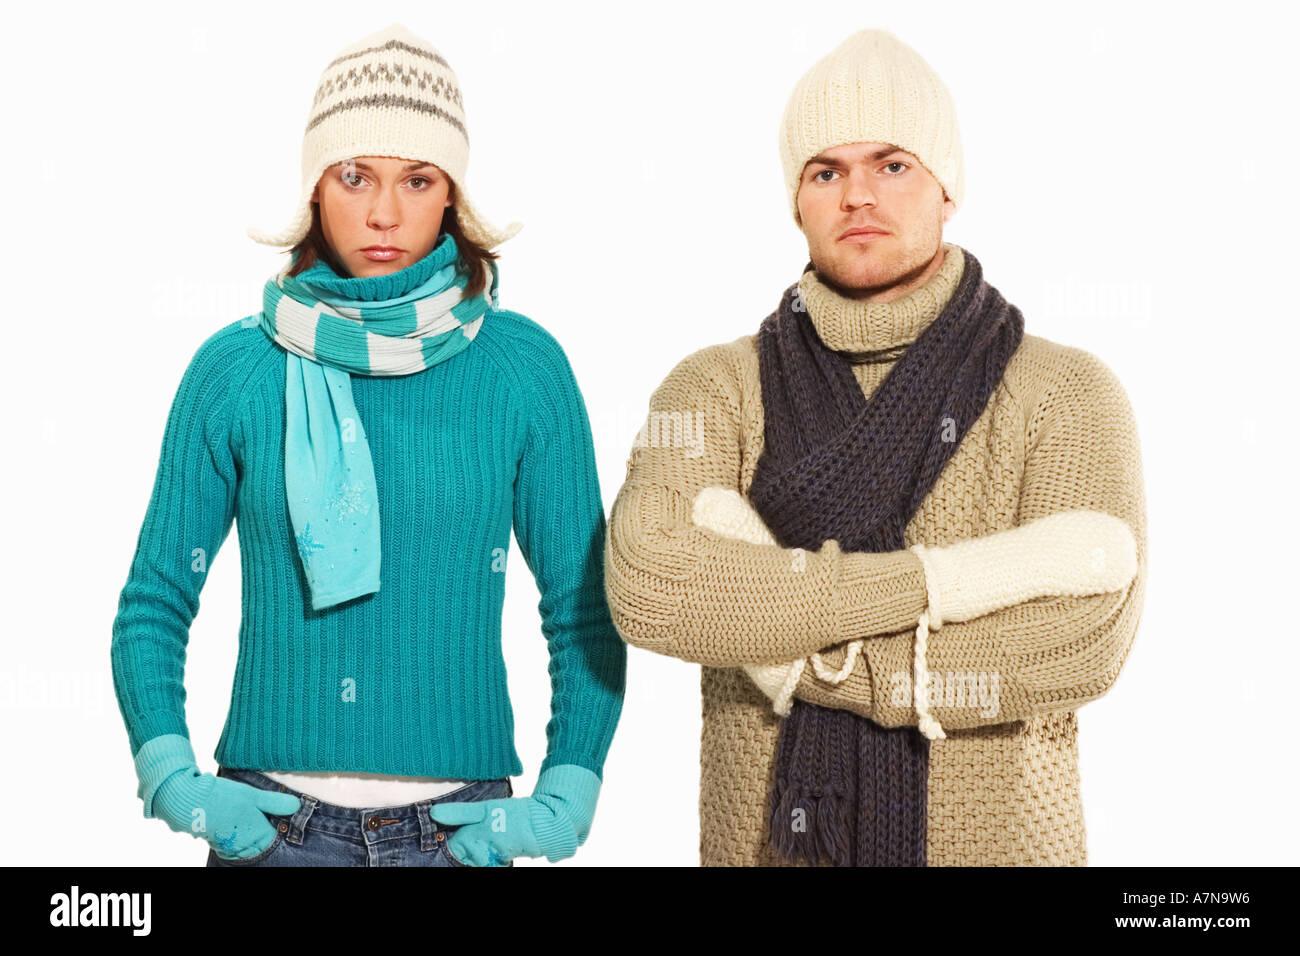 41884fc2b0e studio winter couple woman young man 25 30 cap scarf glove gloves sweater  sweaters blue fashion close up horizontal